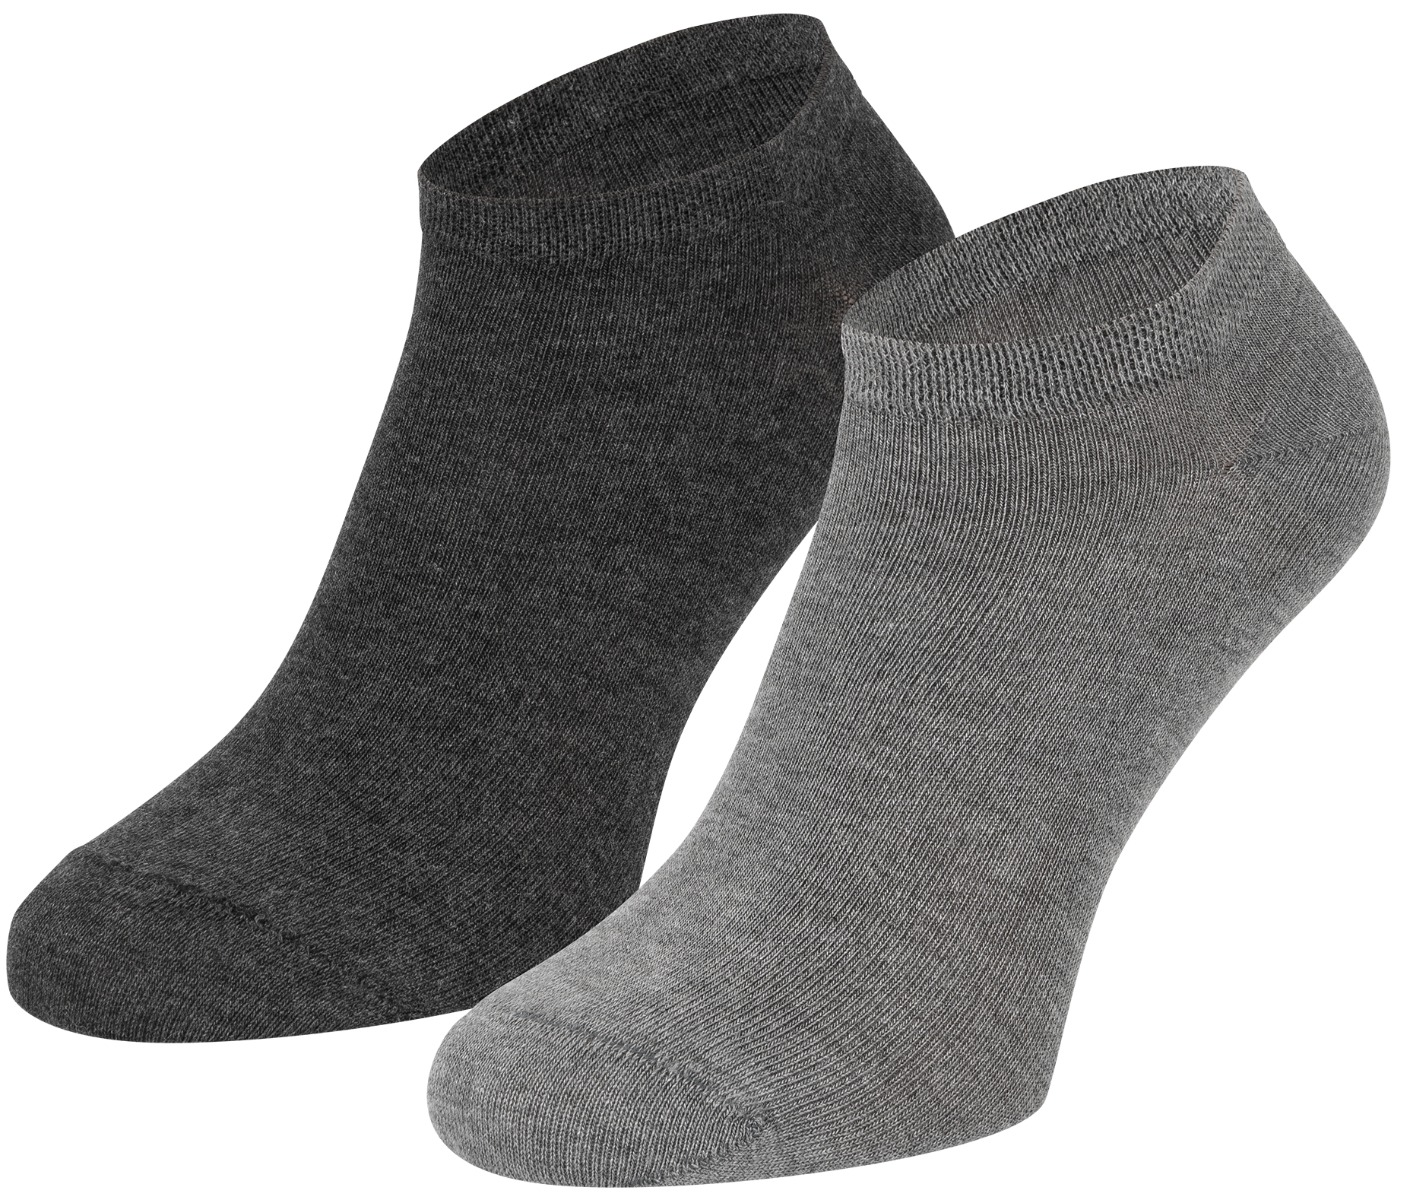 Bamboe sneakersokken-Light grey dark grey-36/40